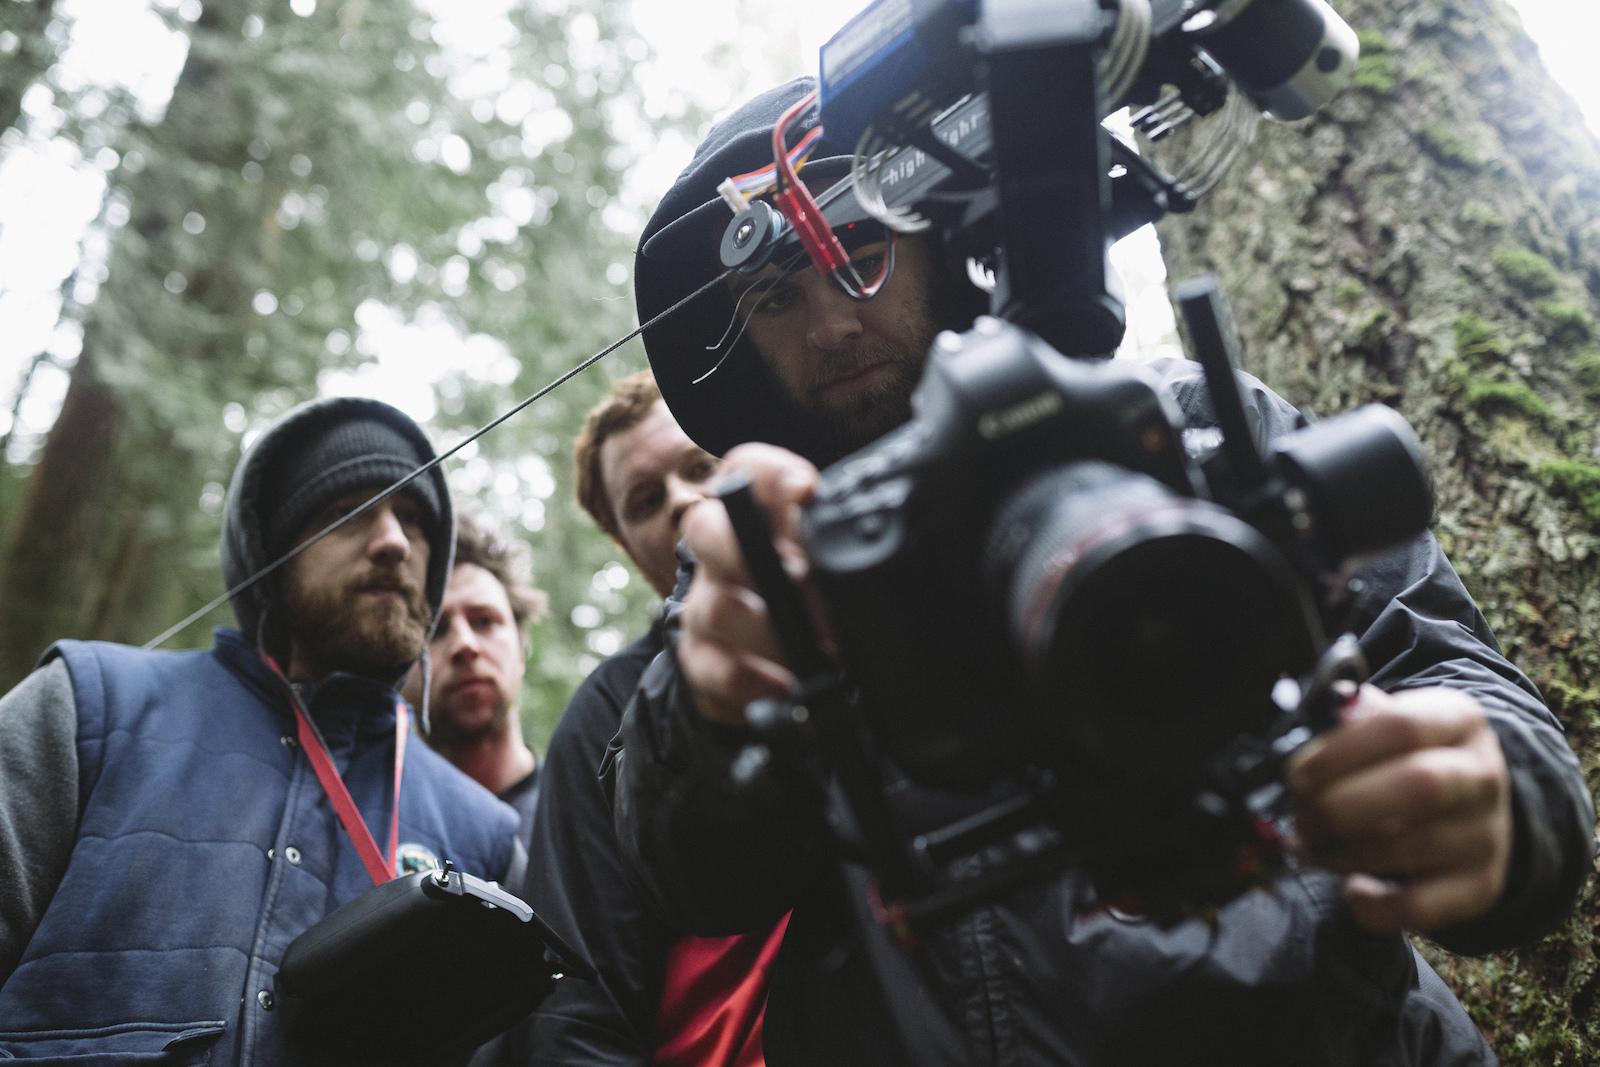 Nic Genovese - Coastal Range BC www.motvfilm.com